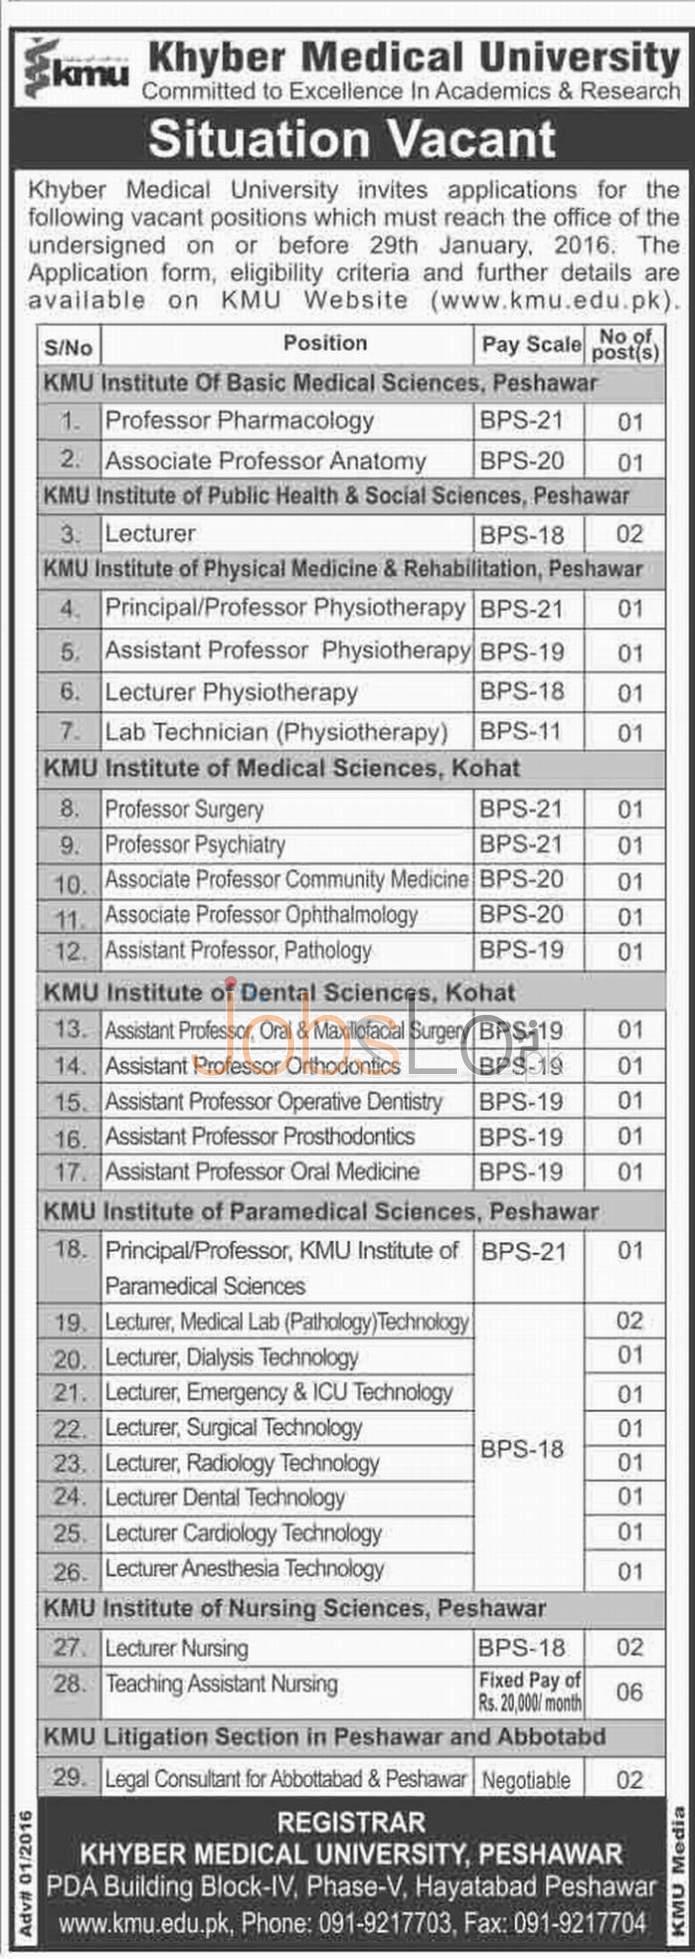 Khyber Medical University KMU Peshawar Jobs January 2016 Application Form